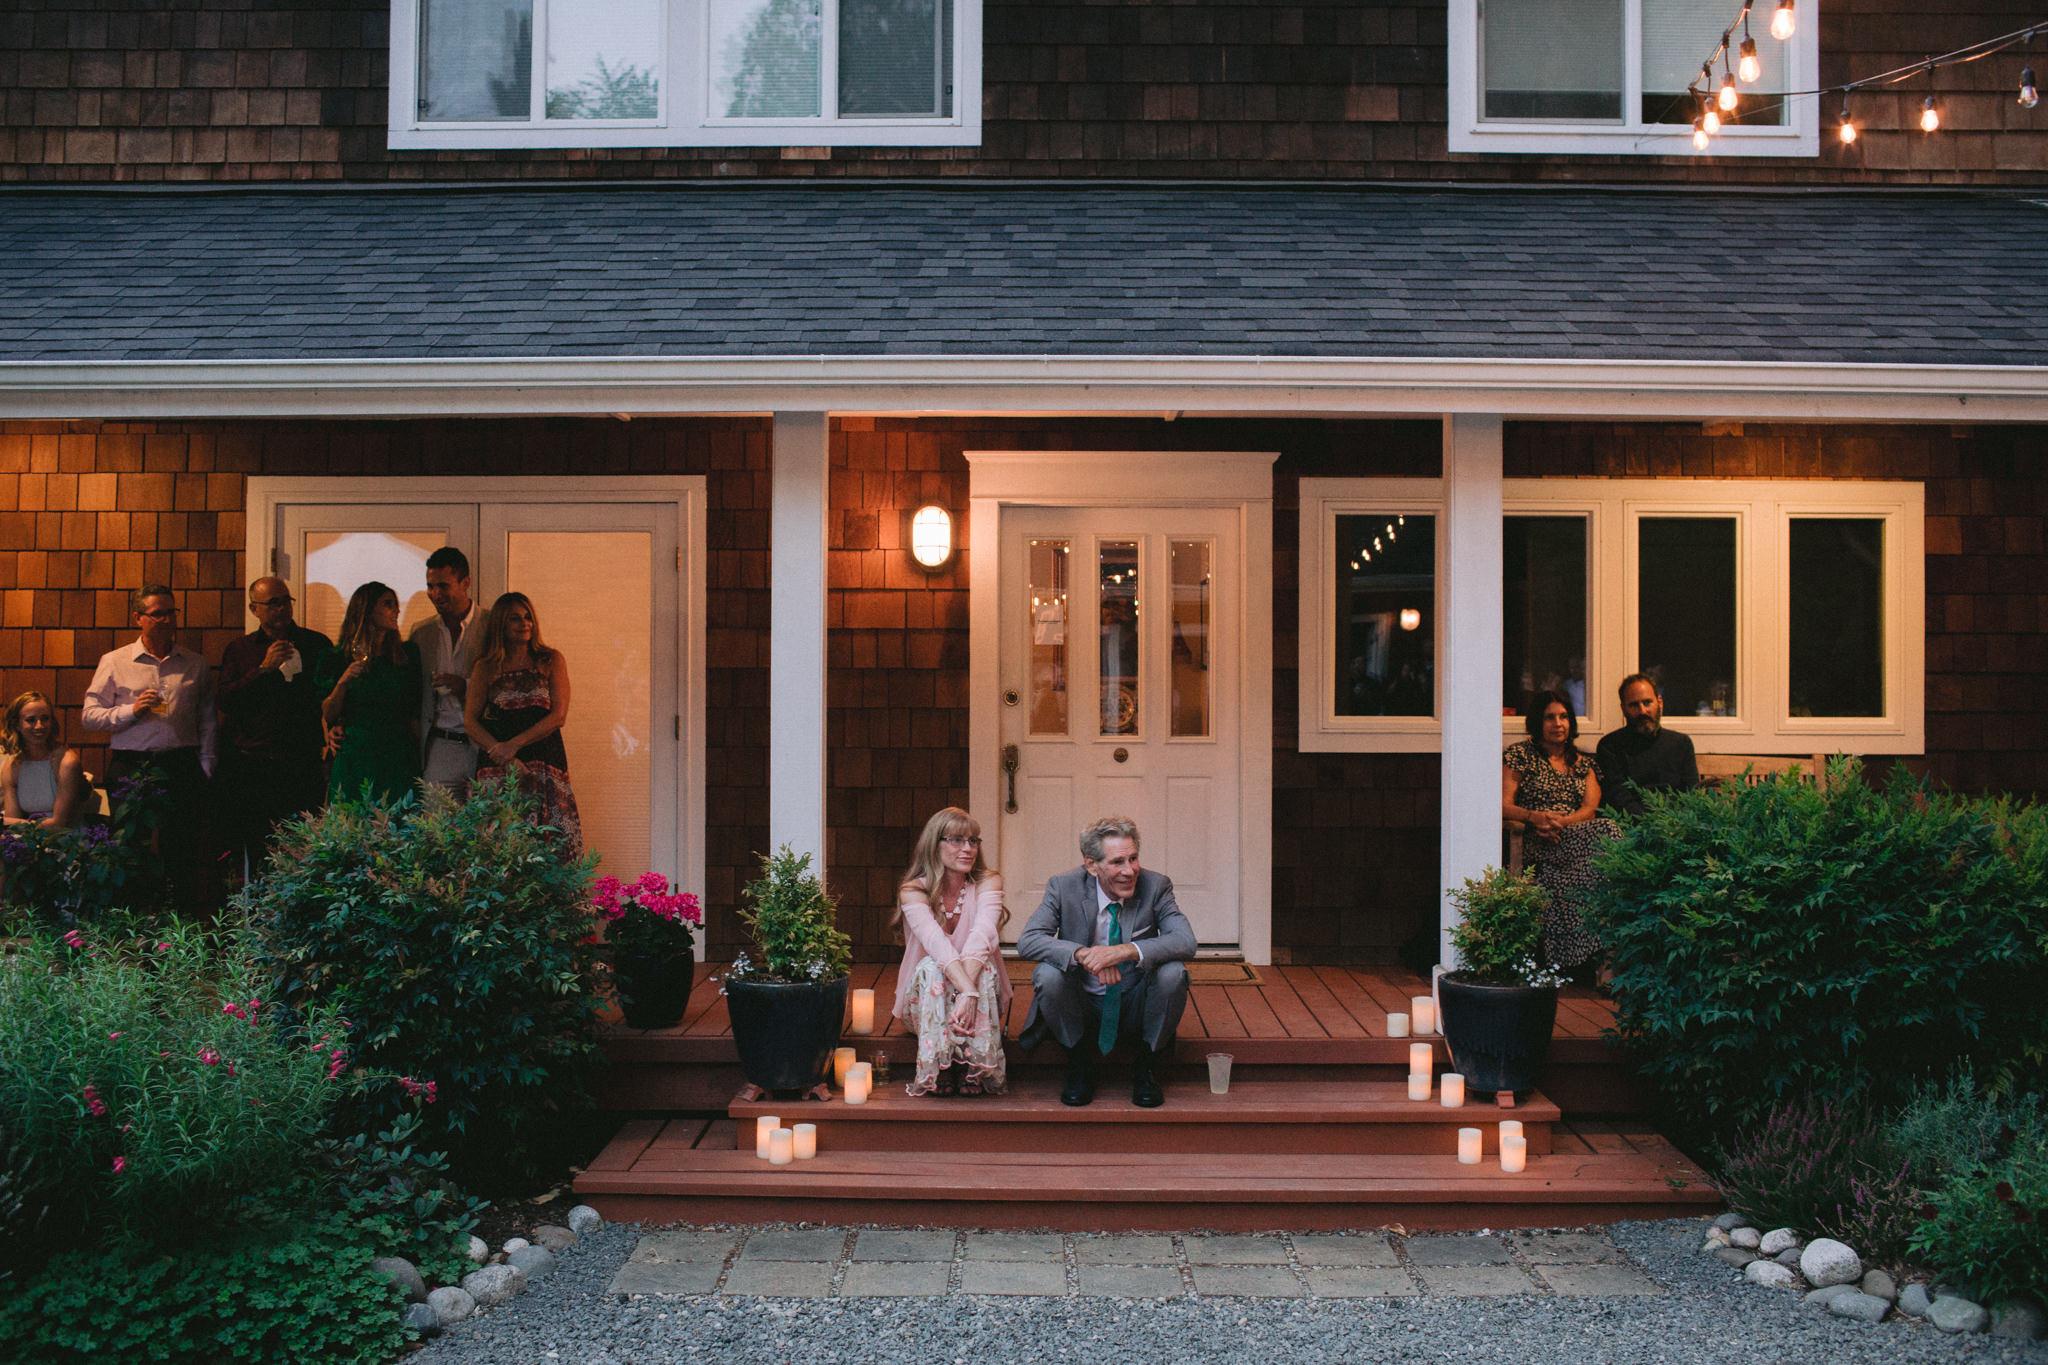 Backyard-Bainbridge-Island-Wedding-Alycia-Lovell-Photography-213.JPG